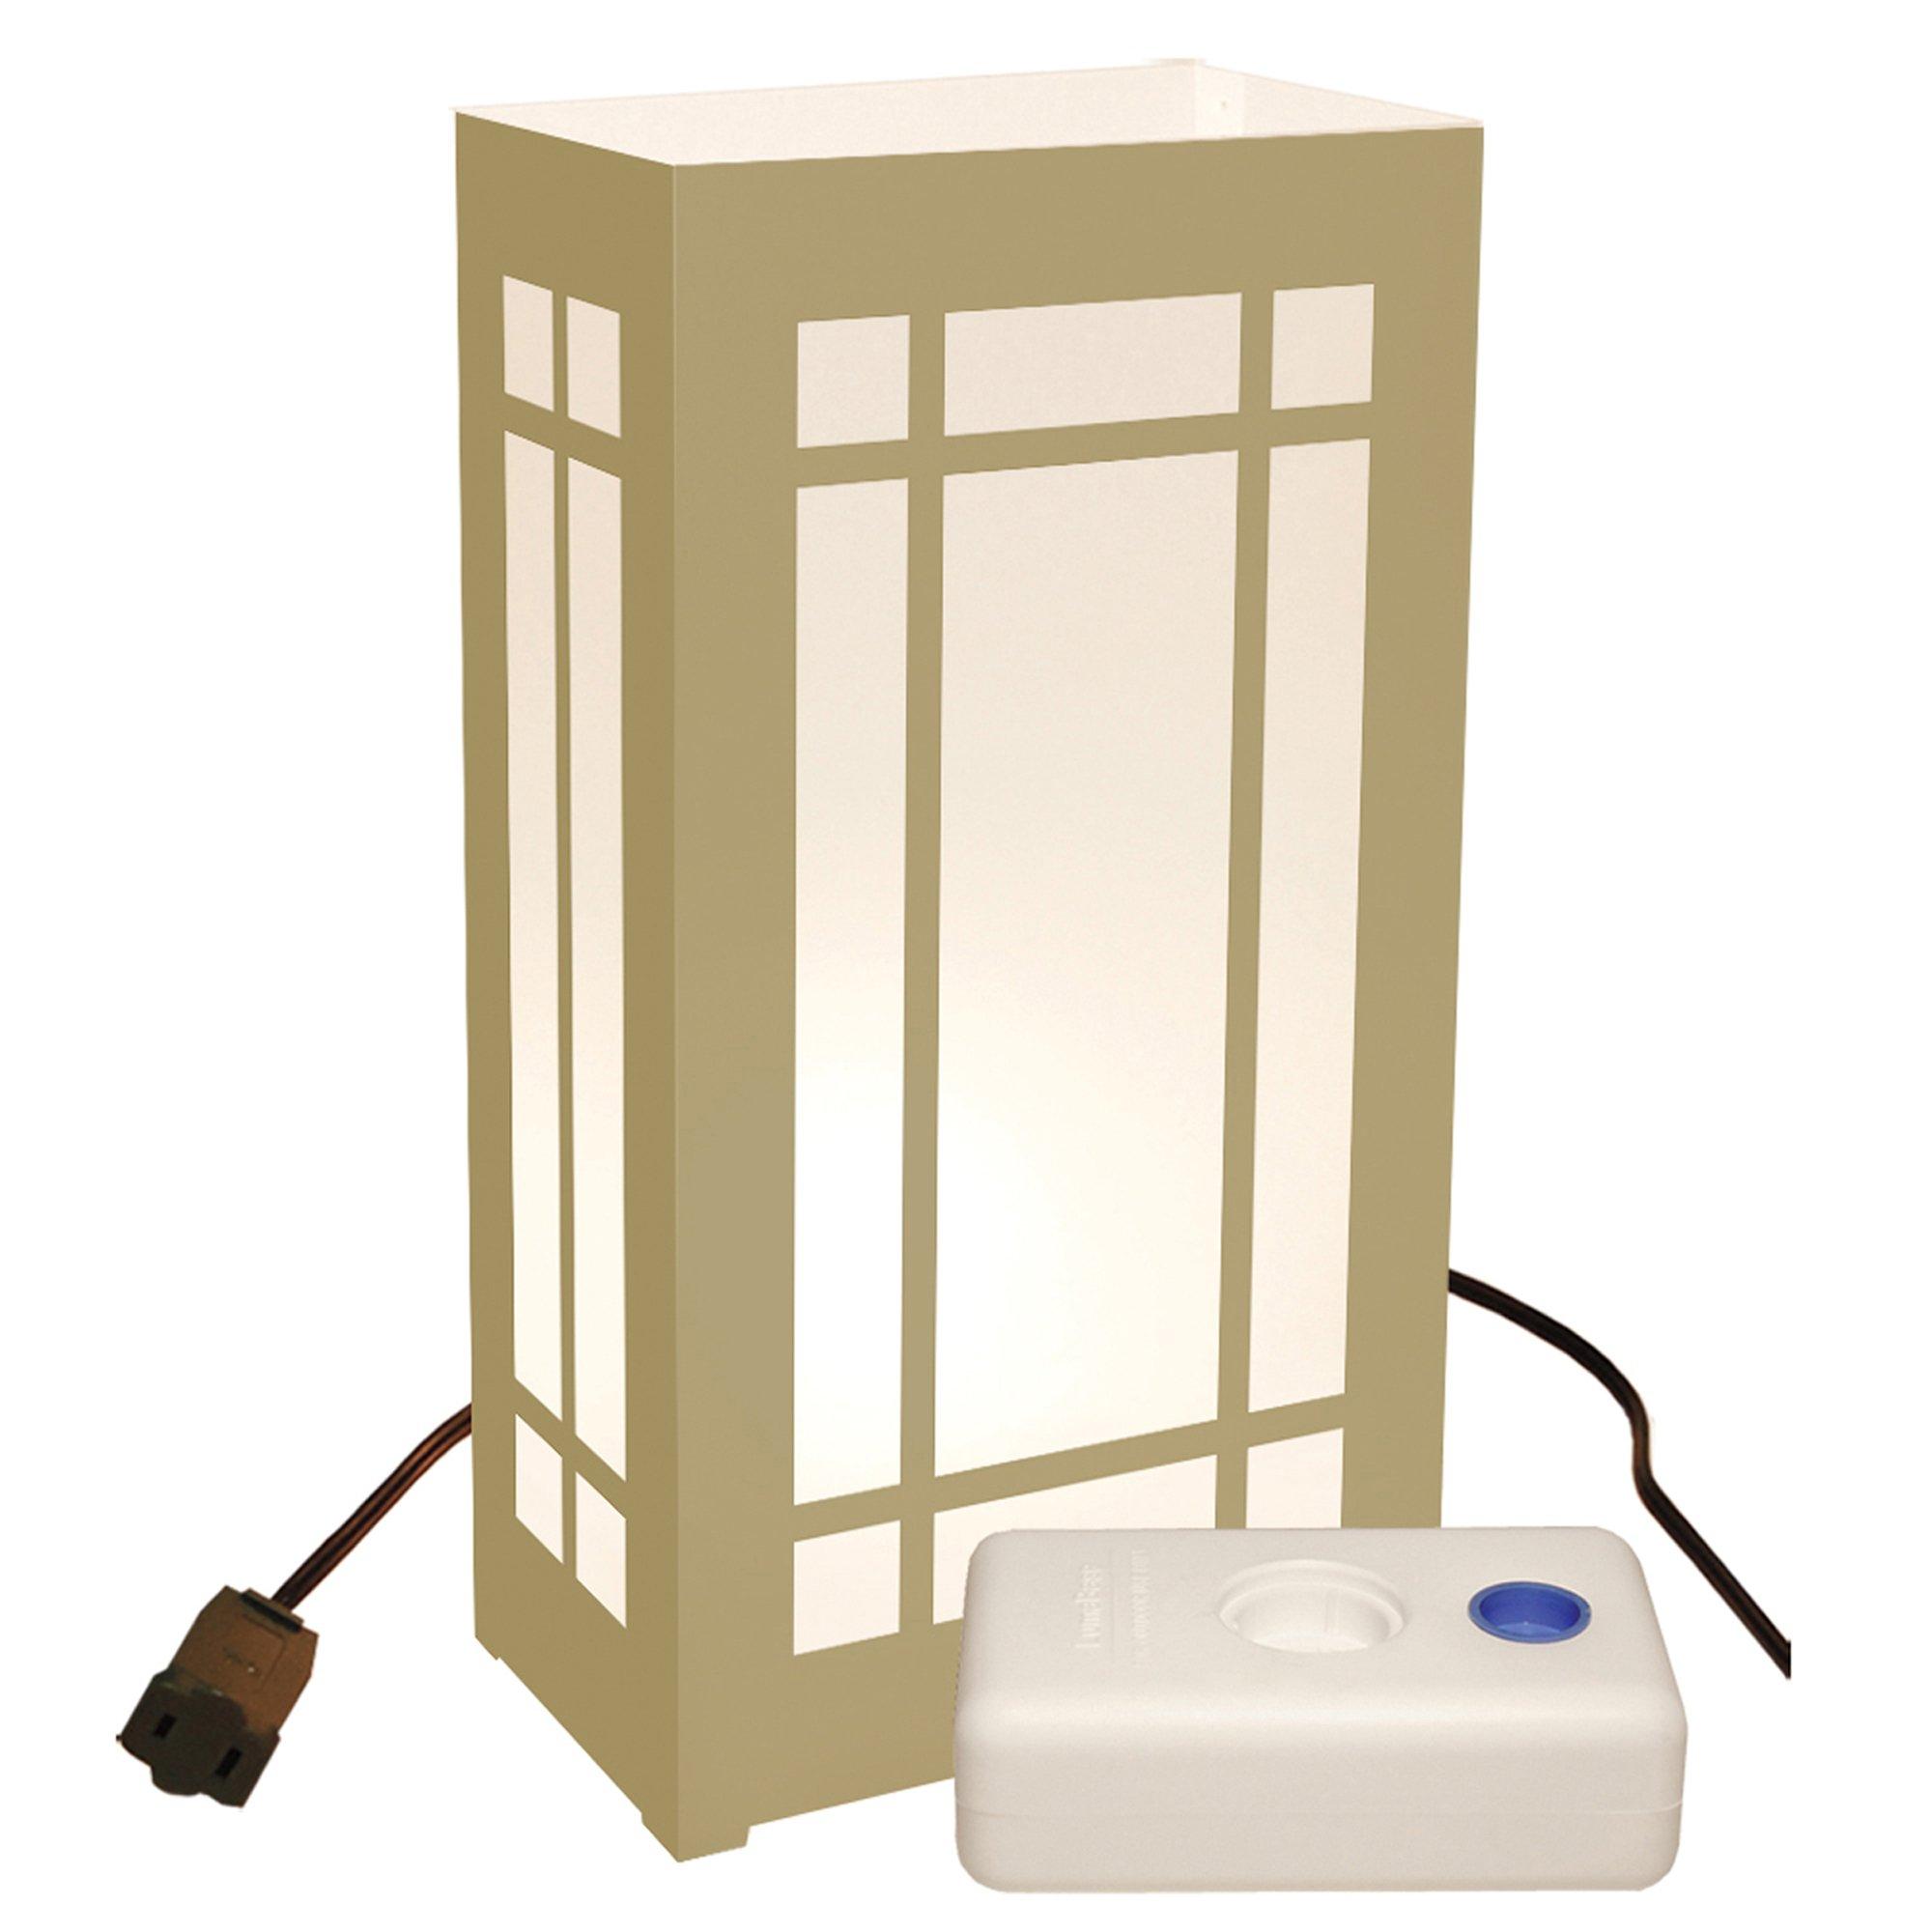 LumaBase 61610 10 Count Gold Lantern Electric Luminaria Kit with LumaBases